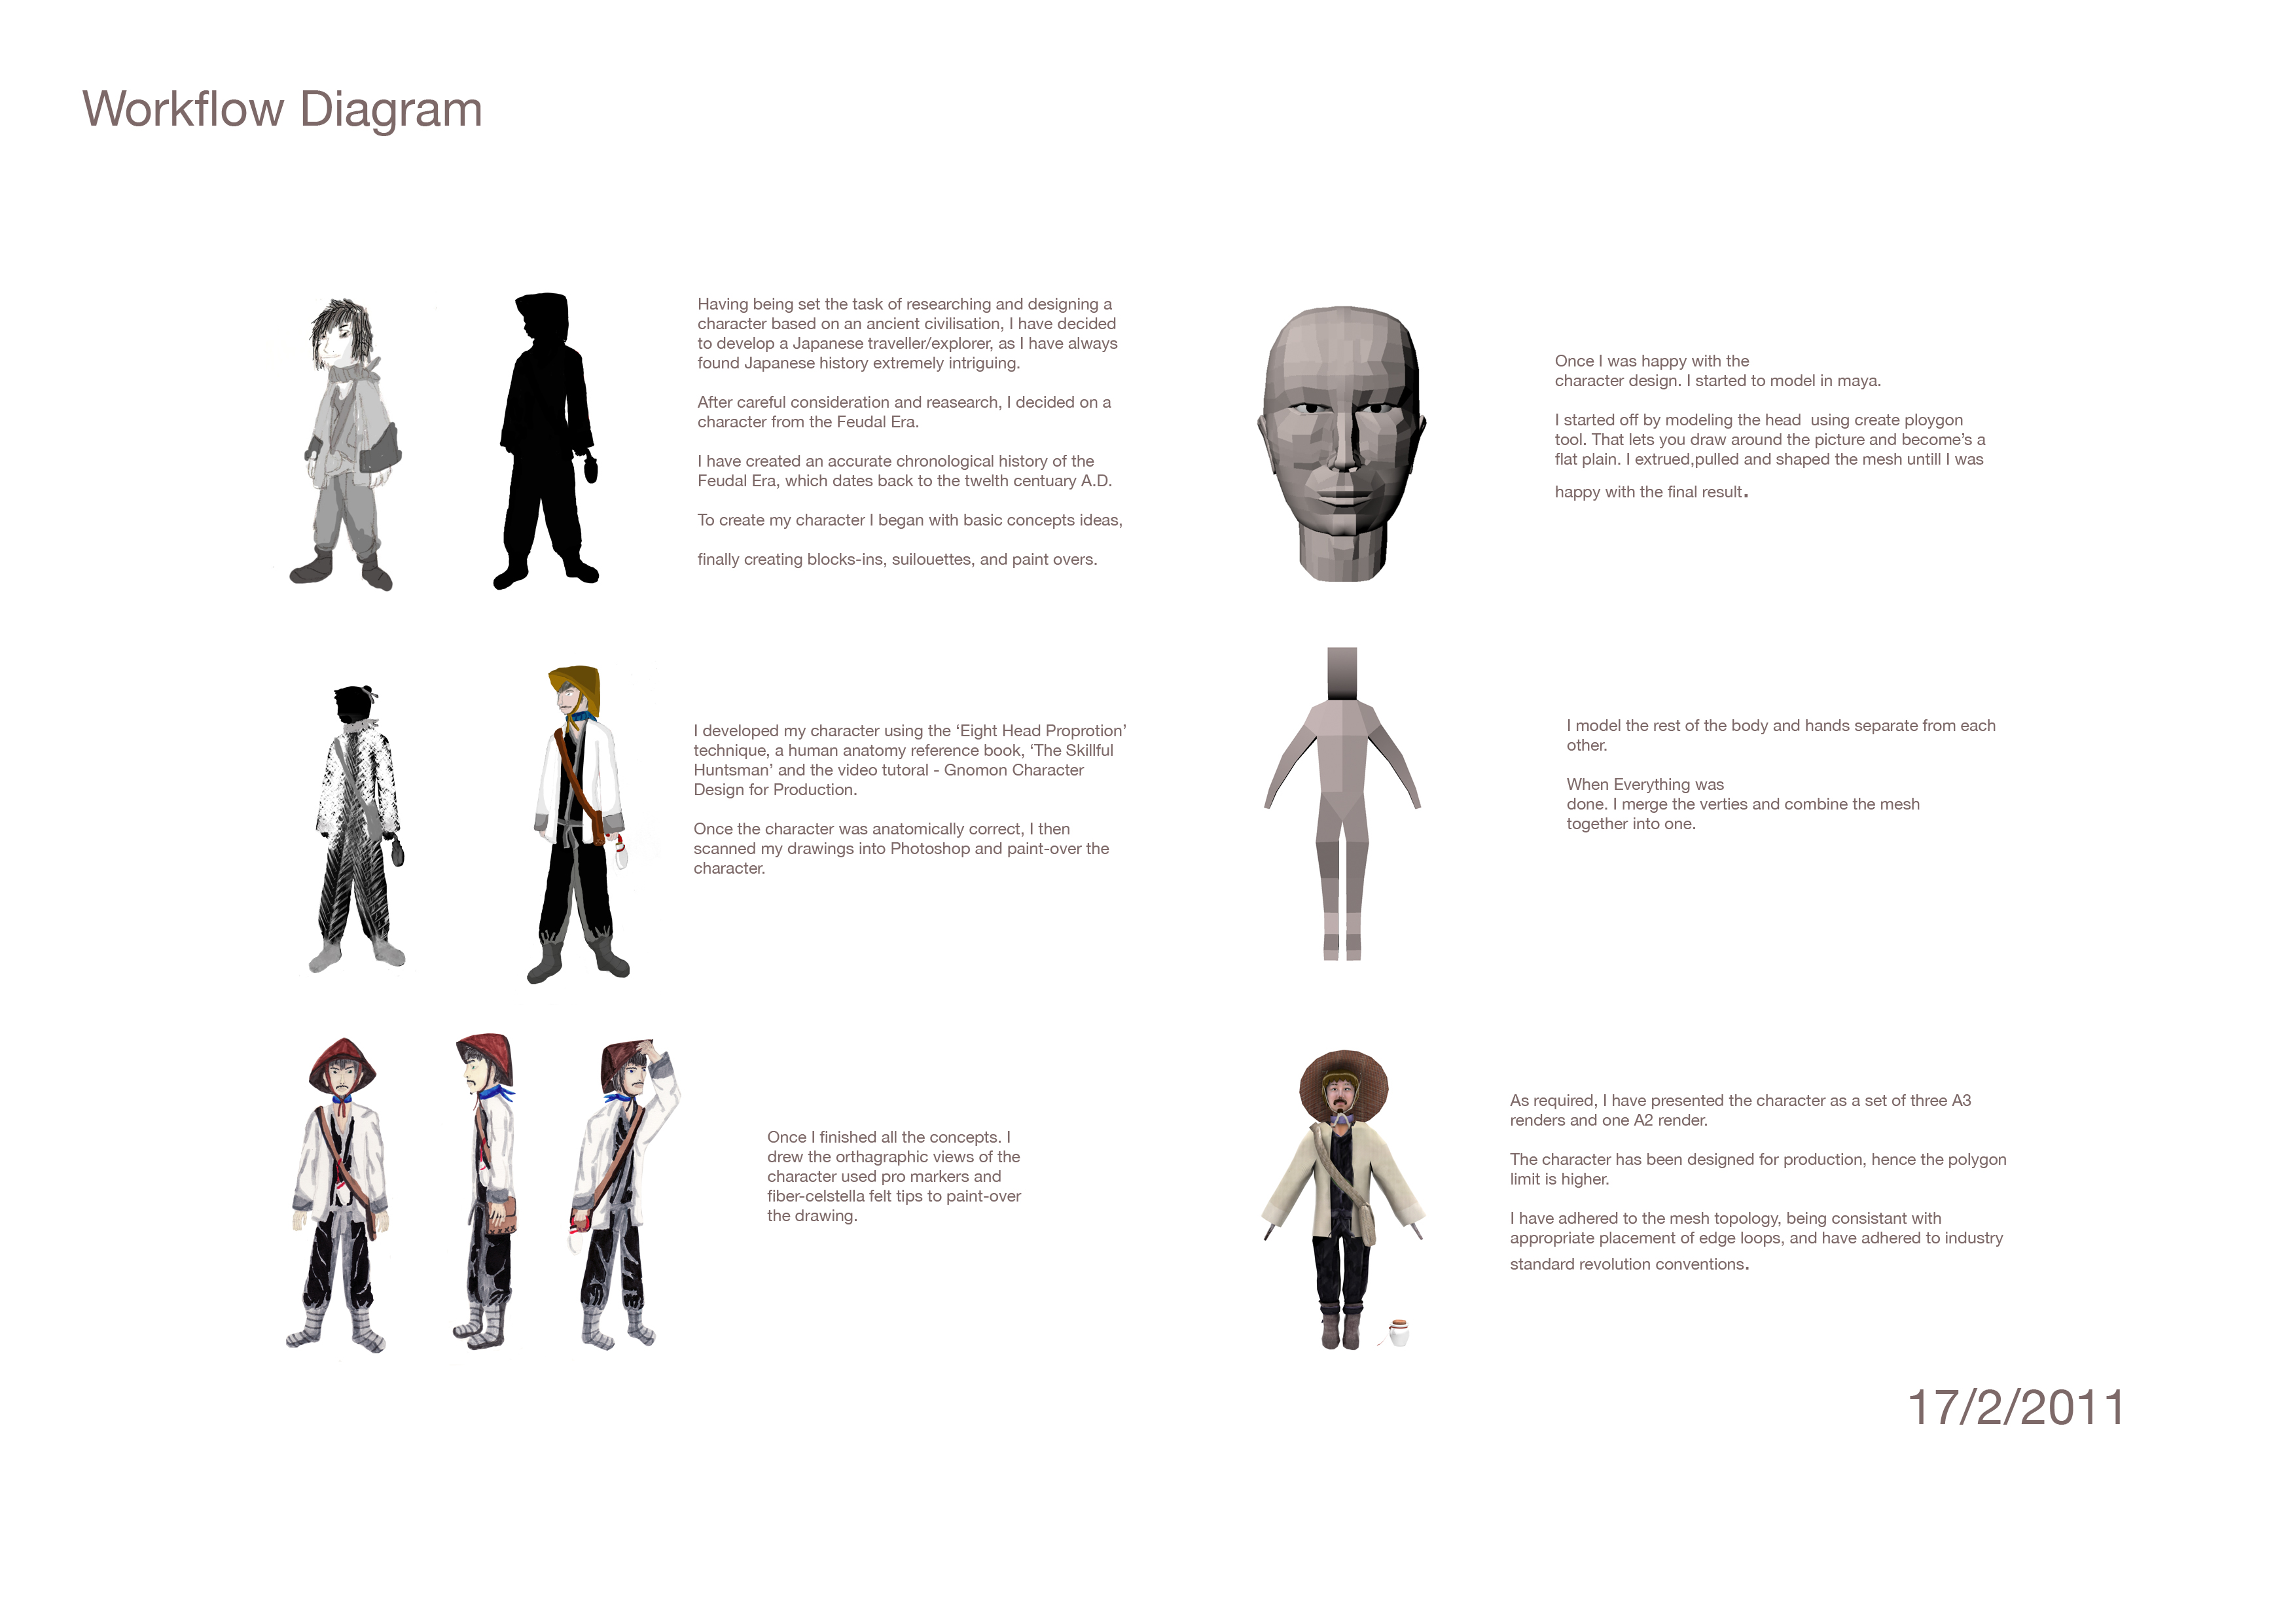 Character Design Workflow Diagram